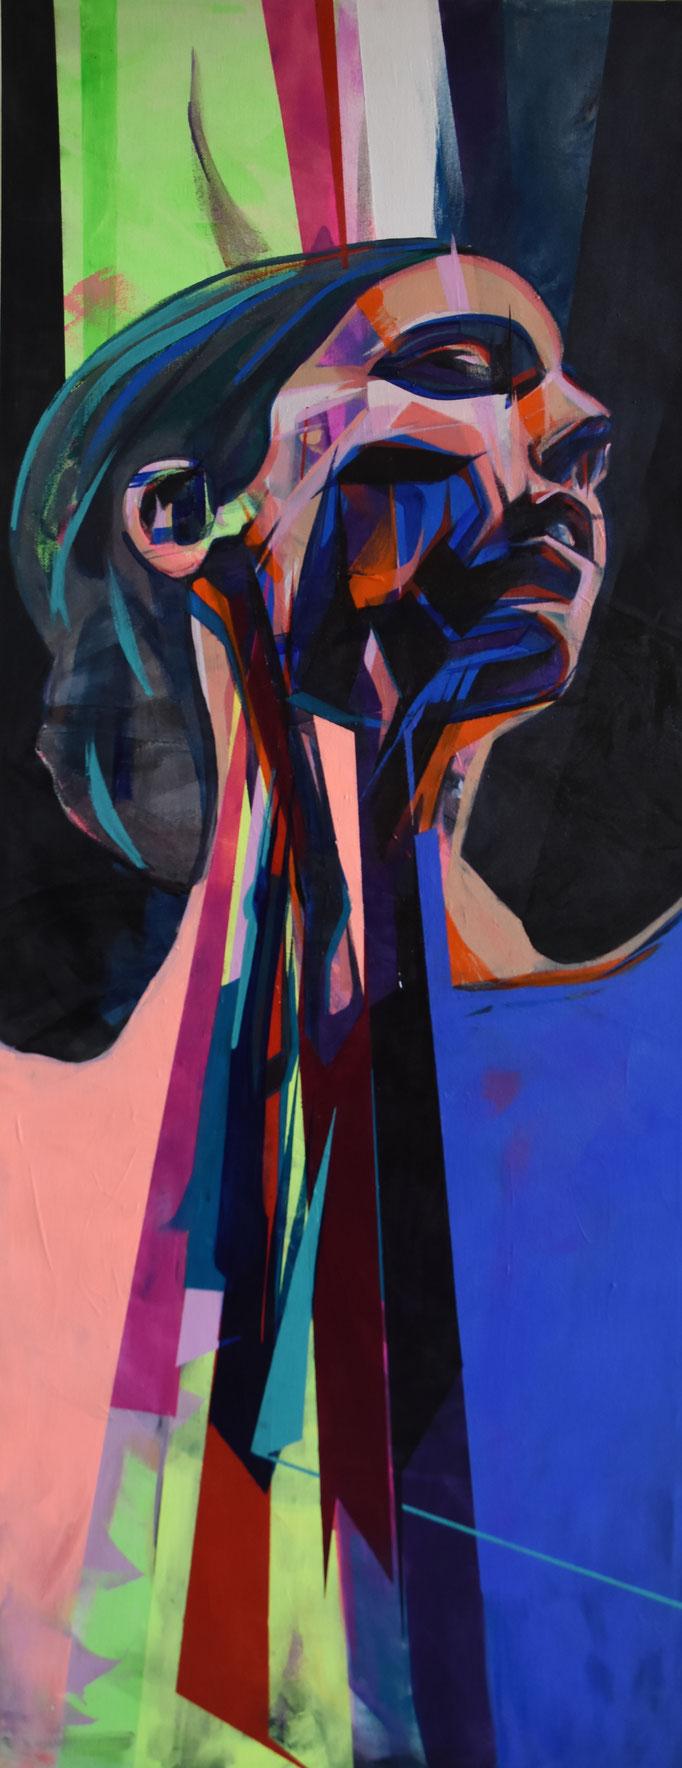 REFLEX II, 2017, Acrylic on canvas, 64cm x 163cm